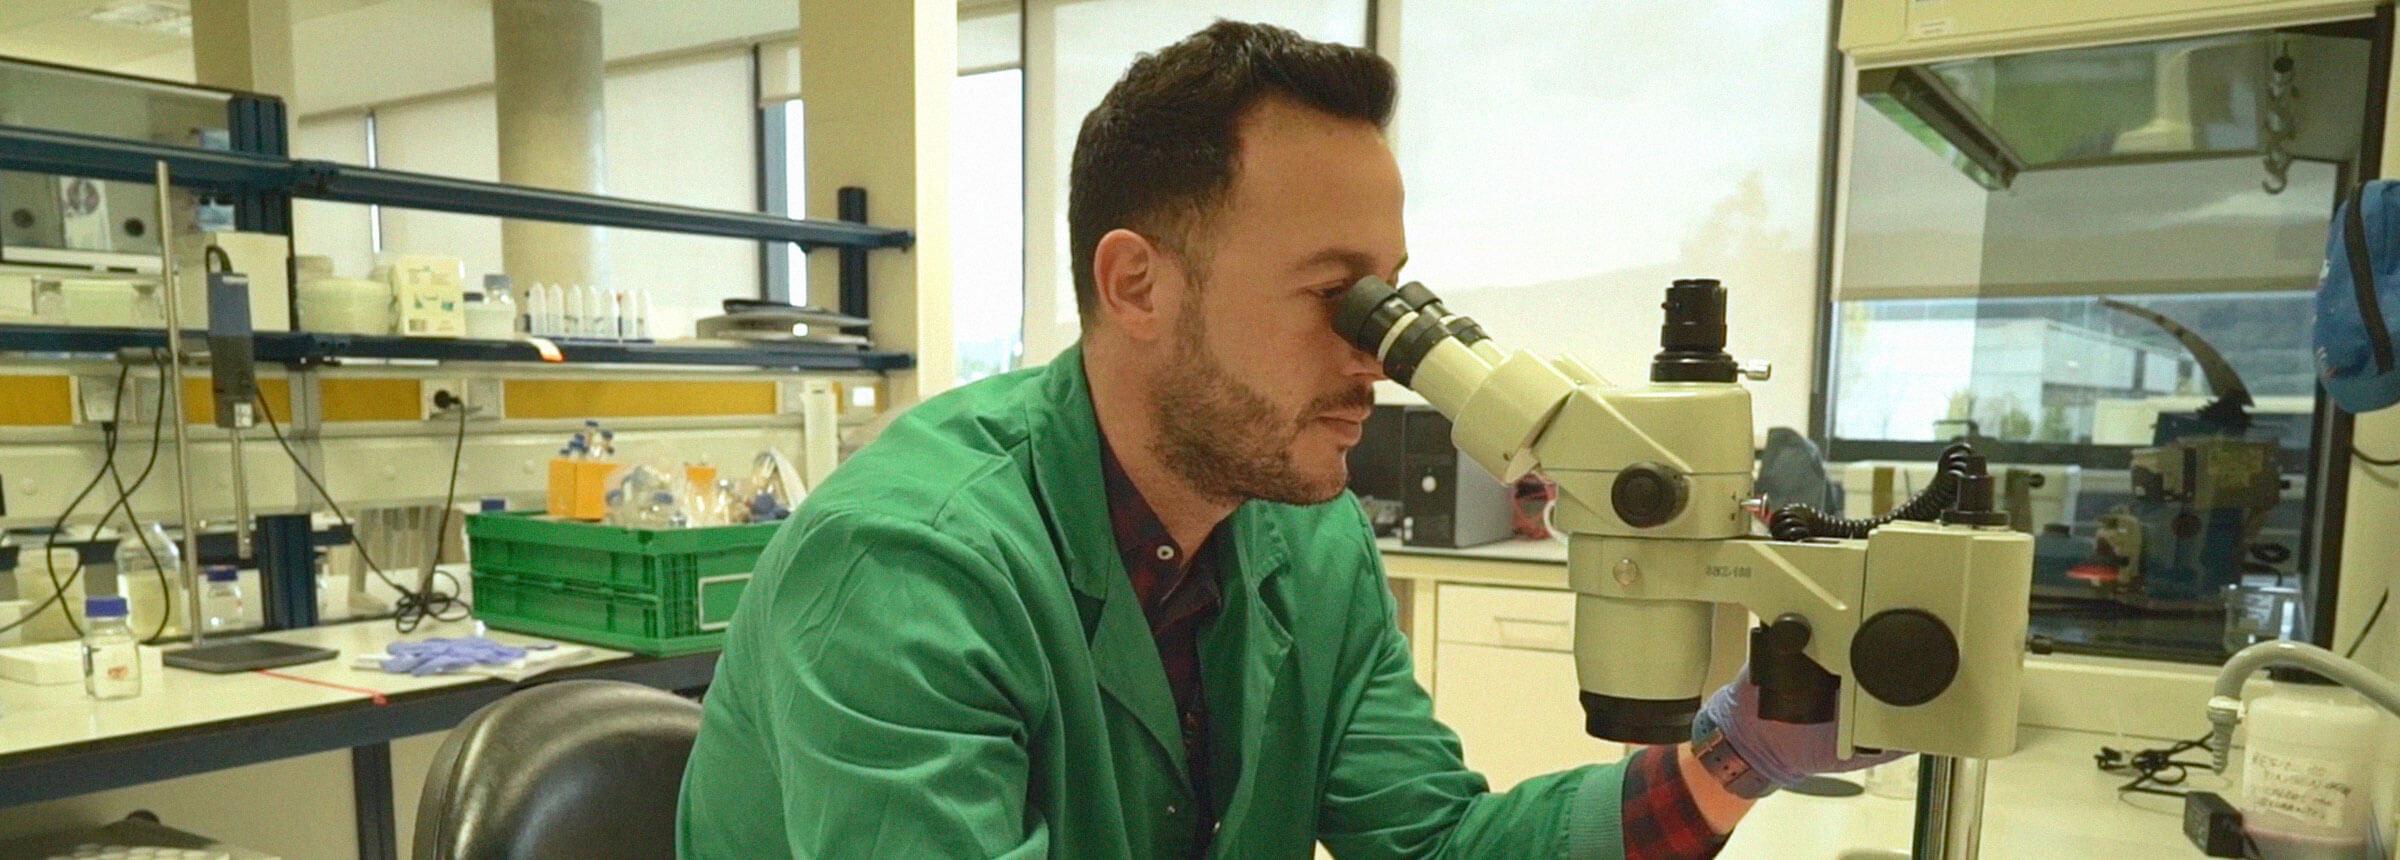 laboratorio-microescopio-probetas-proceso-sobre-azti